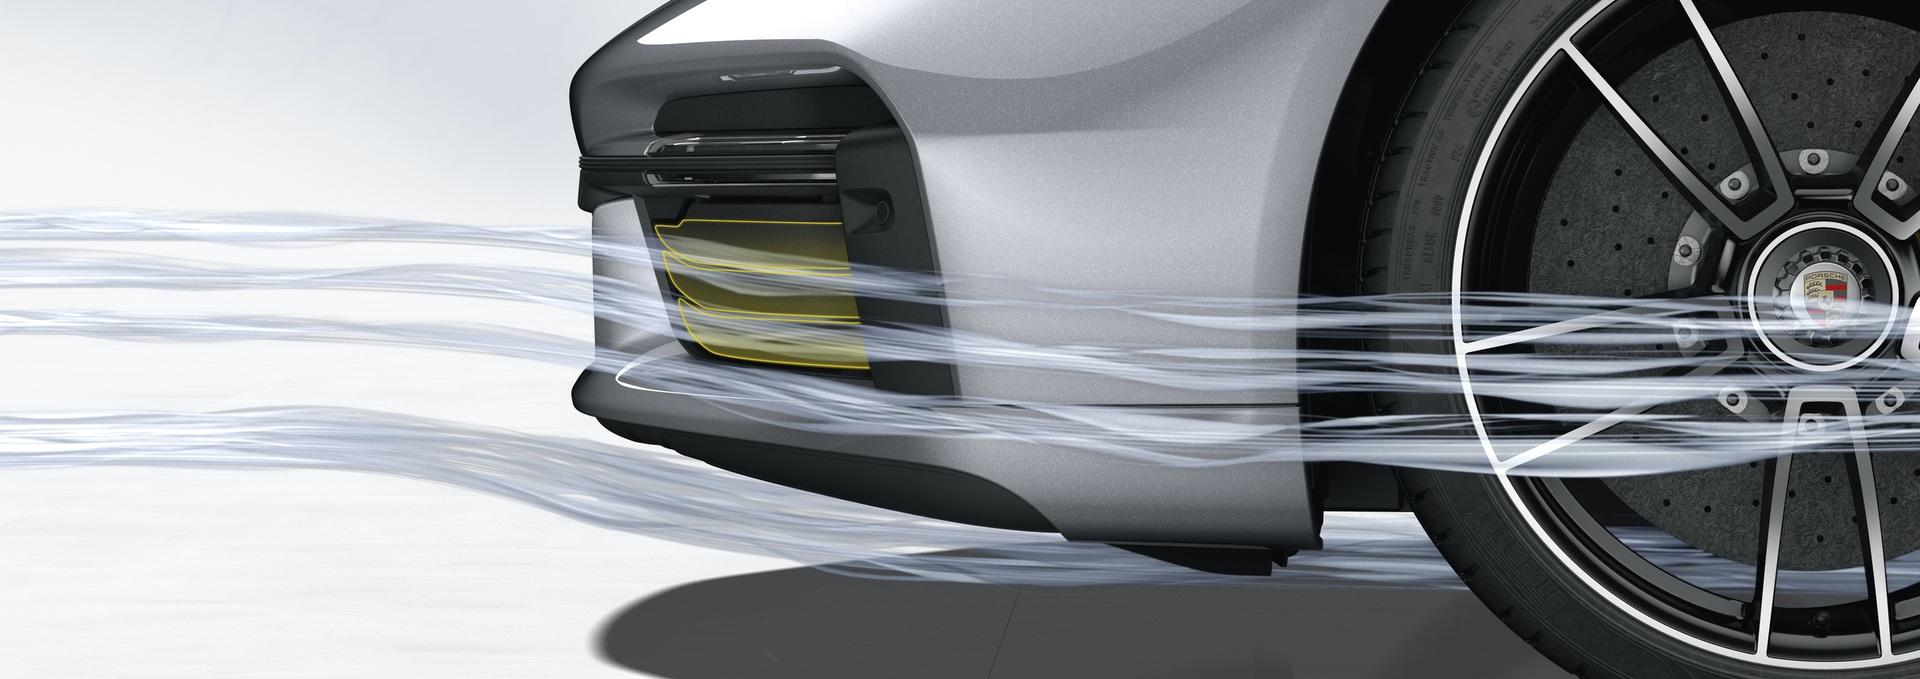 2020_Porsche_911-Turbo_S-aerodynamics_0002